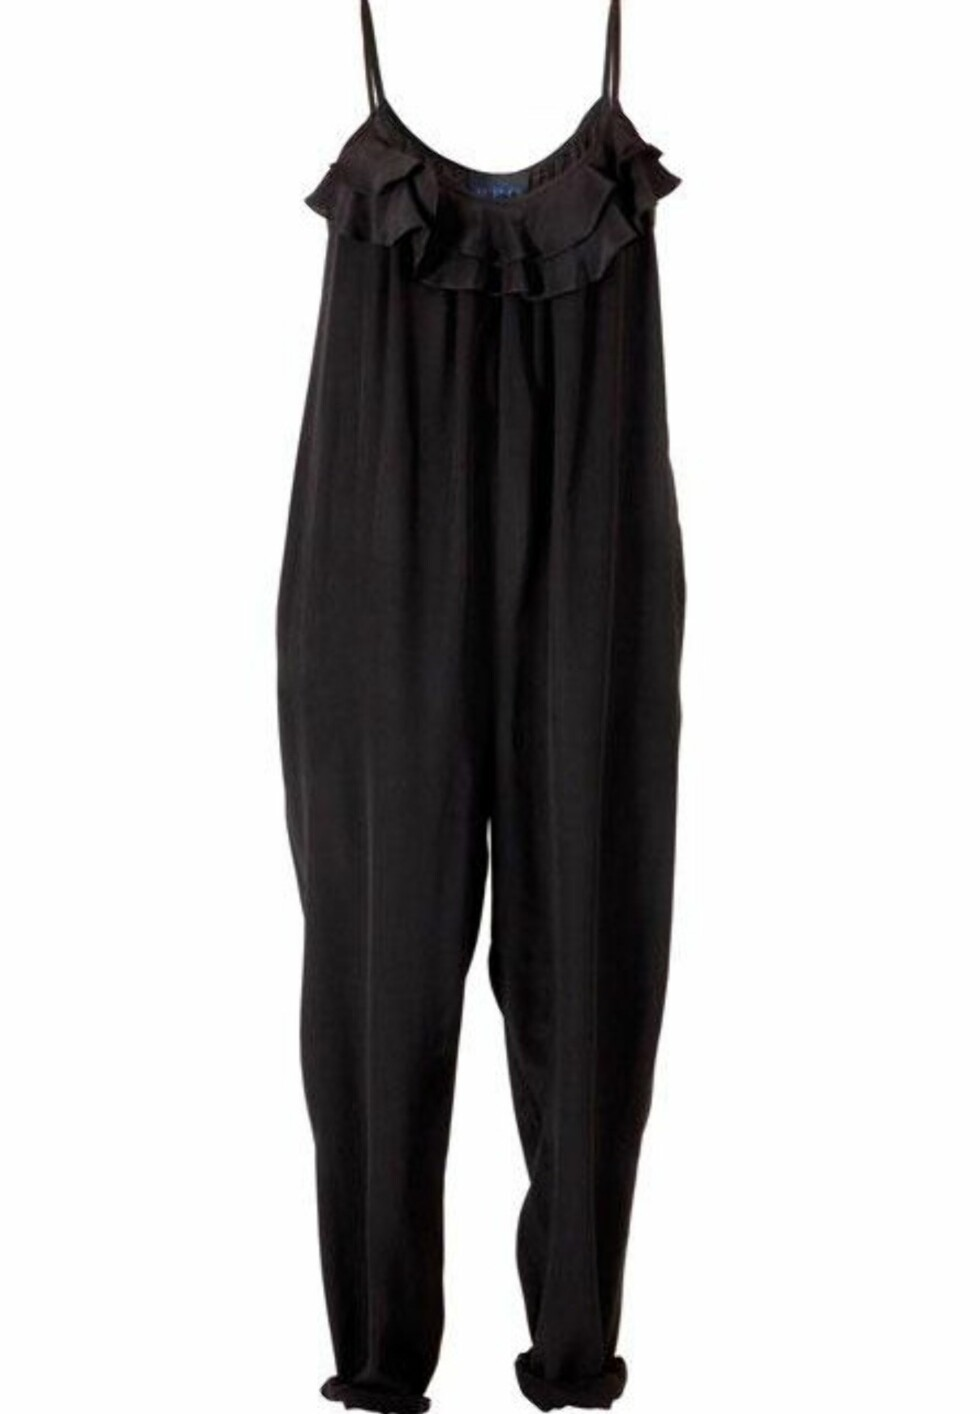 SPAR 1685 KRONER: Funky buksedress i svart silke (kr 1685, PPQ/Fashionmixology.no).